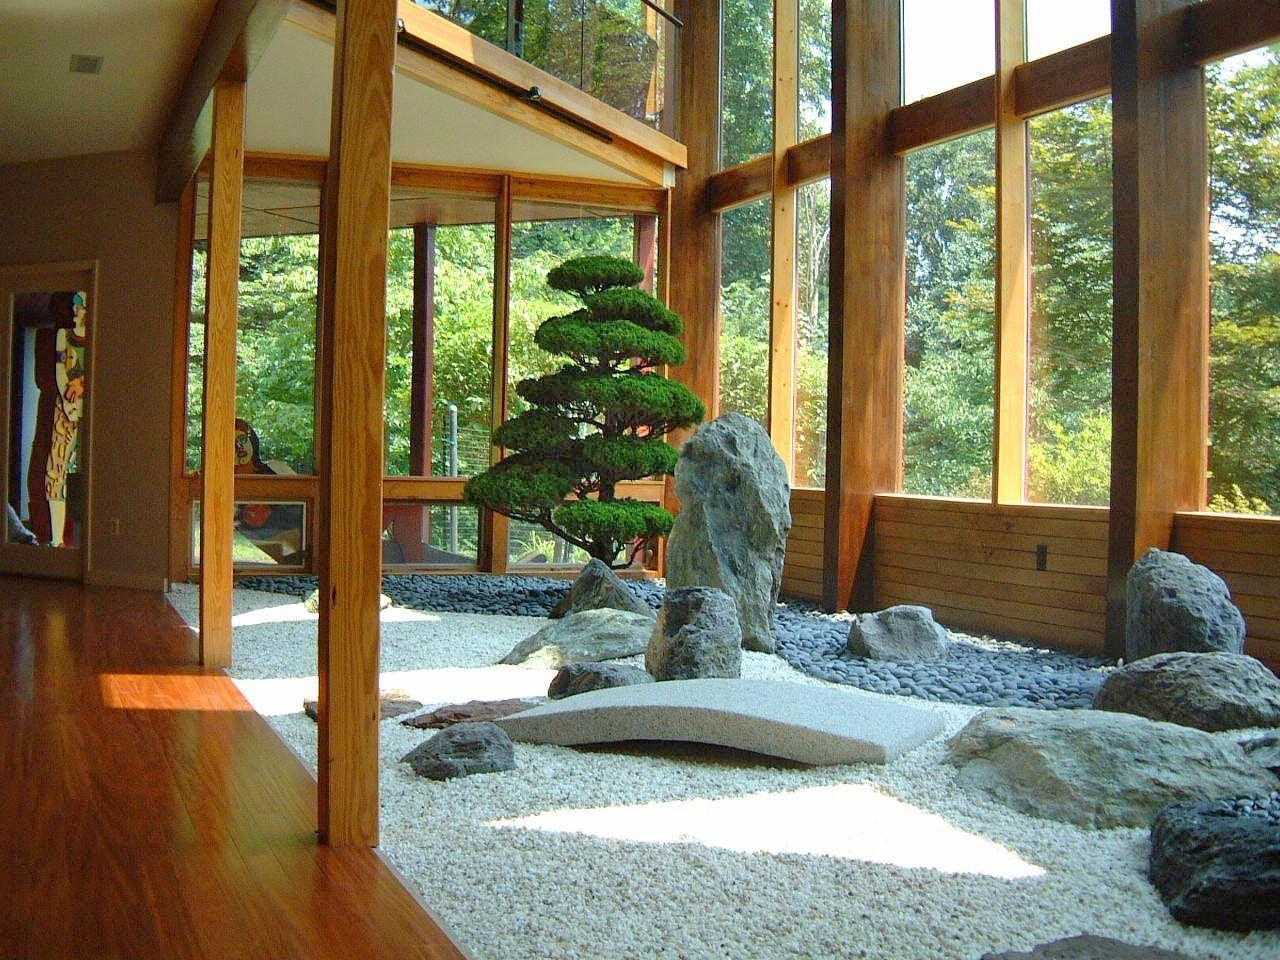 harmonisch garten japanisch japanischergarten japan pflanzen holz japanischer garten. Black Bedroom Furniture Sets. Home Design Ideas